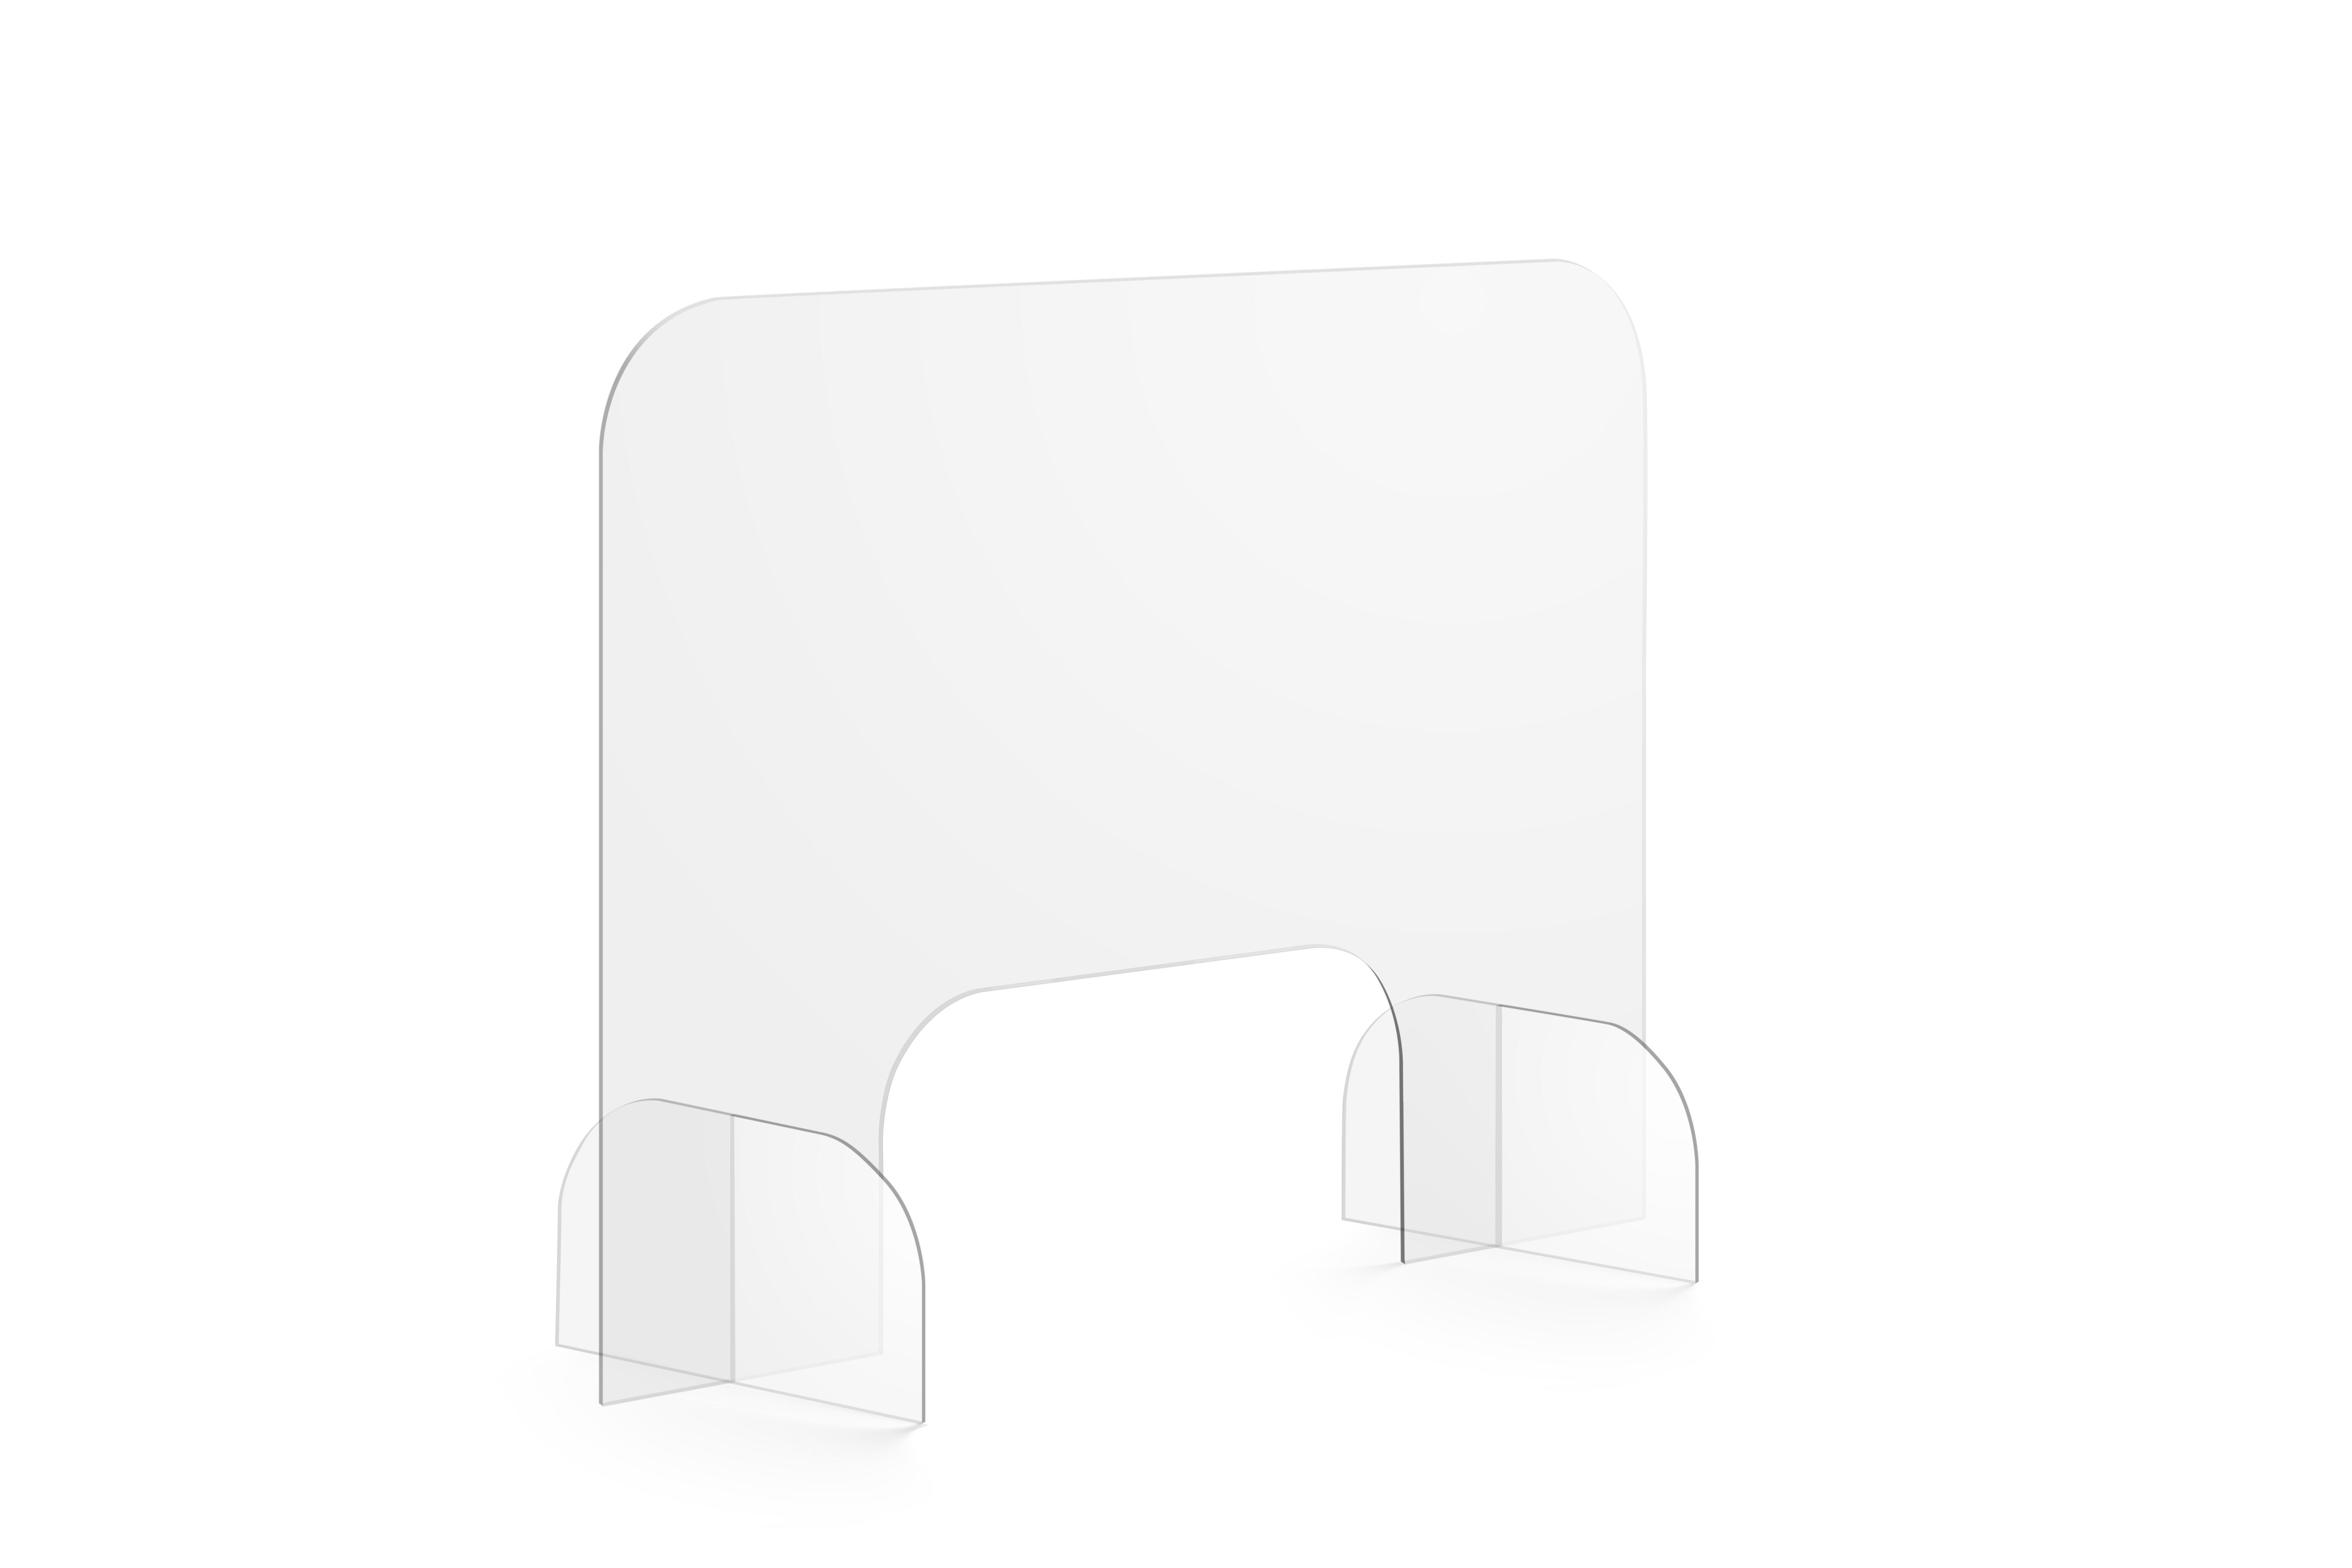 Uniprodo Spuckschutz - 80 x 60 cm - Acrylglas - Durchreiche 40 x 20 cm UNI-PGPL03